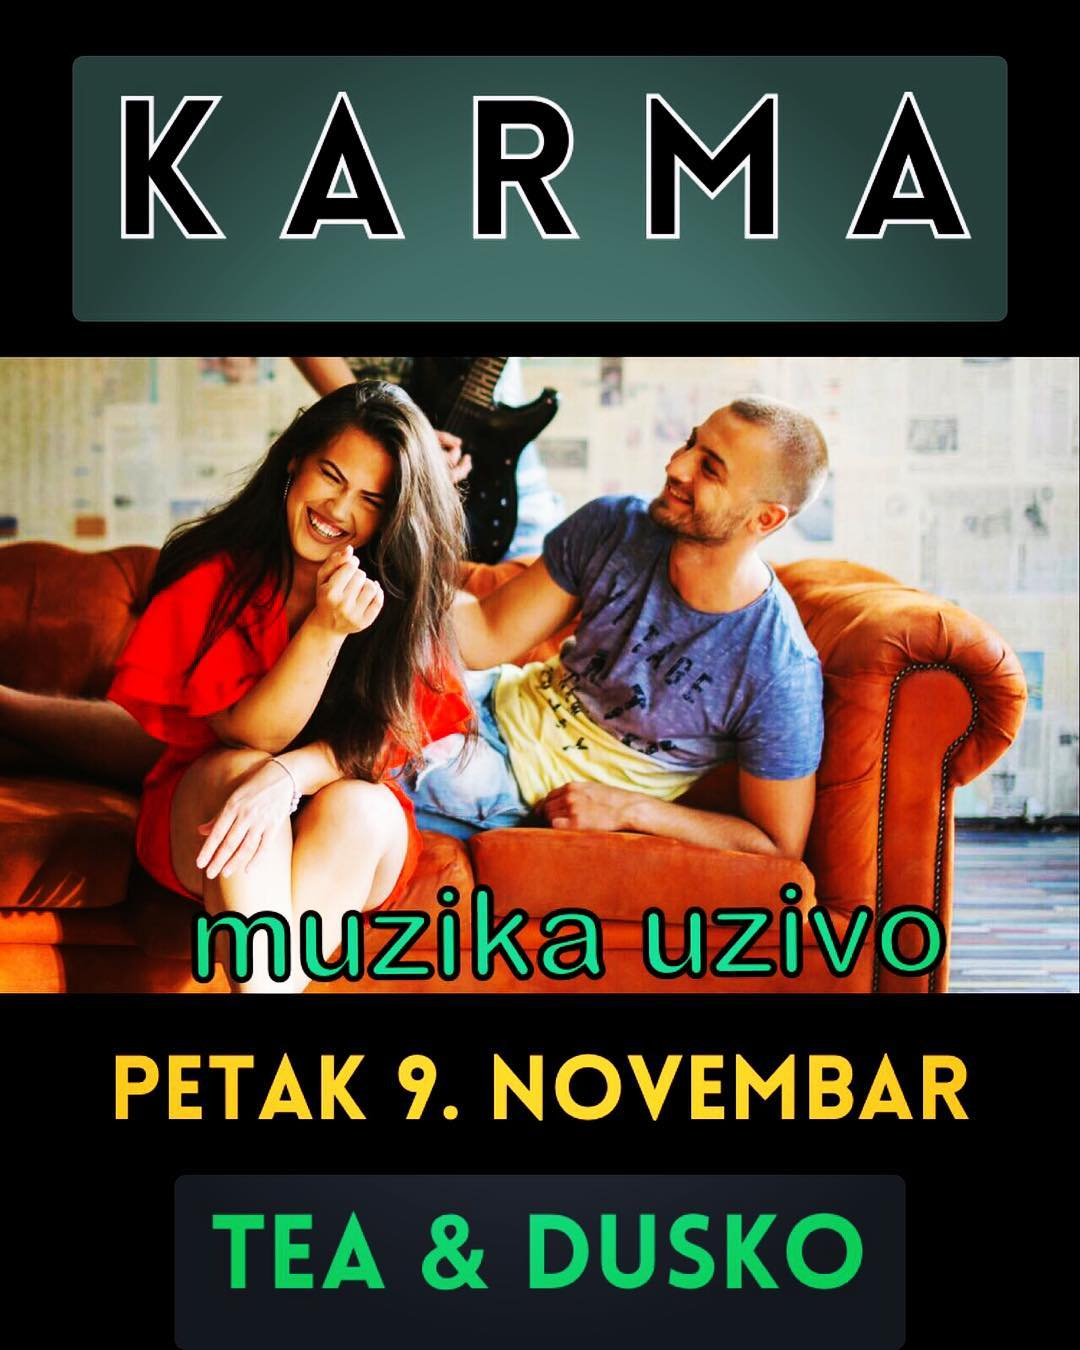 Tea & Duško